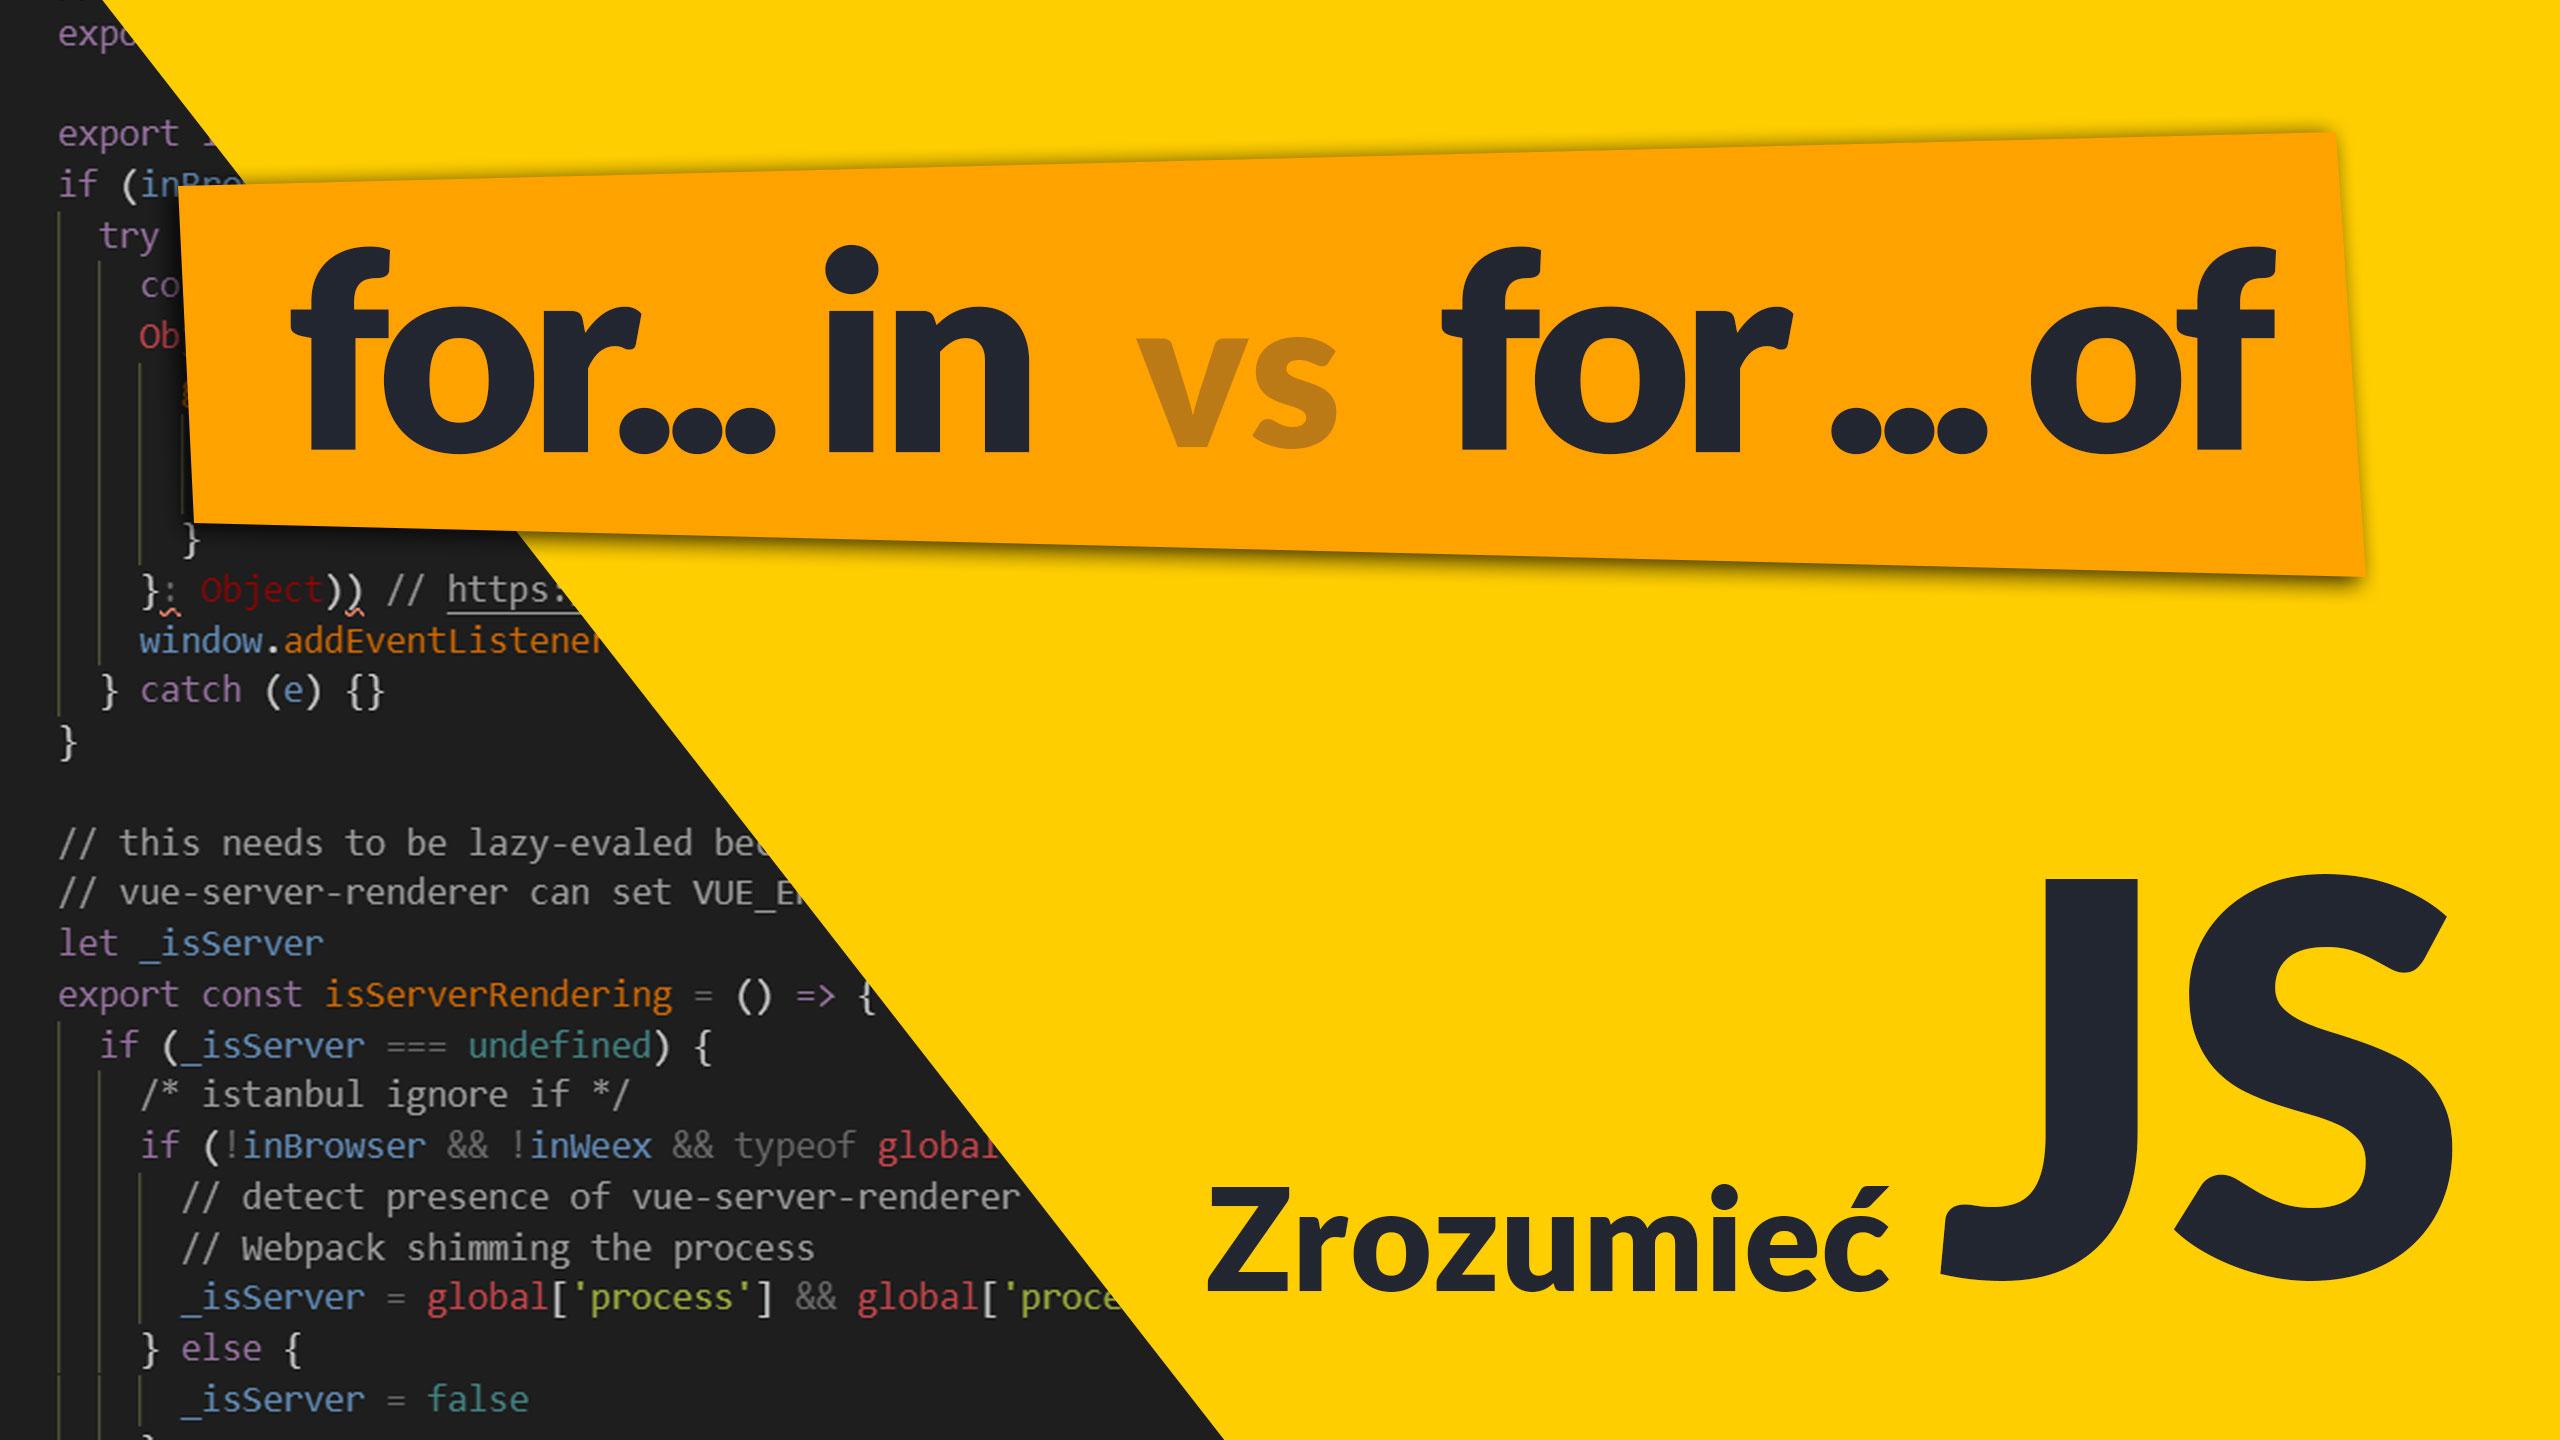 for of in - Pętla for ( ..in ..) vs for (.. of ..) - #10 Zrozumieć JavaScript